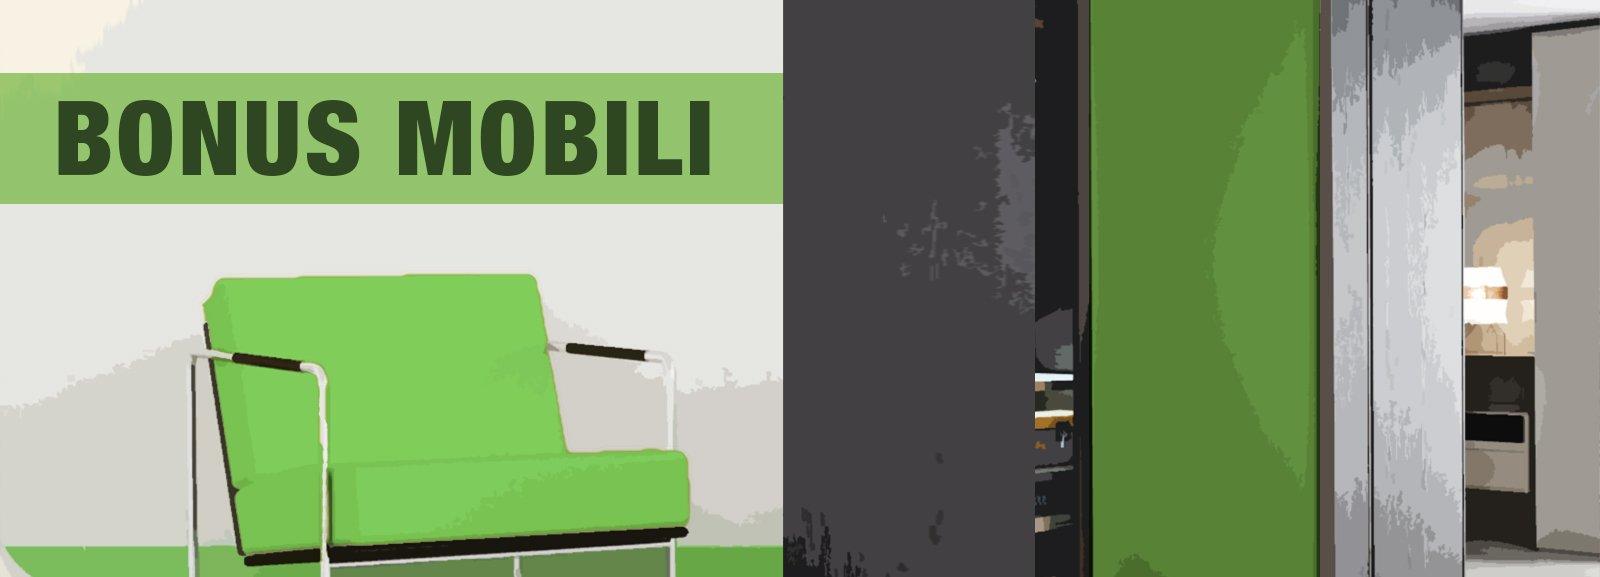 Bonus mobili serve una spesa minima di ristrutturazione cose di casa - Bonus mobili scadenza ...